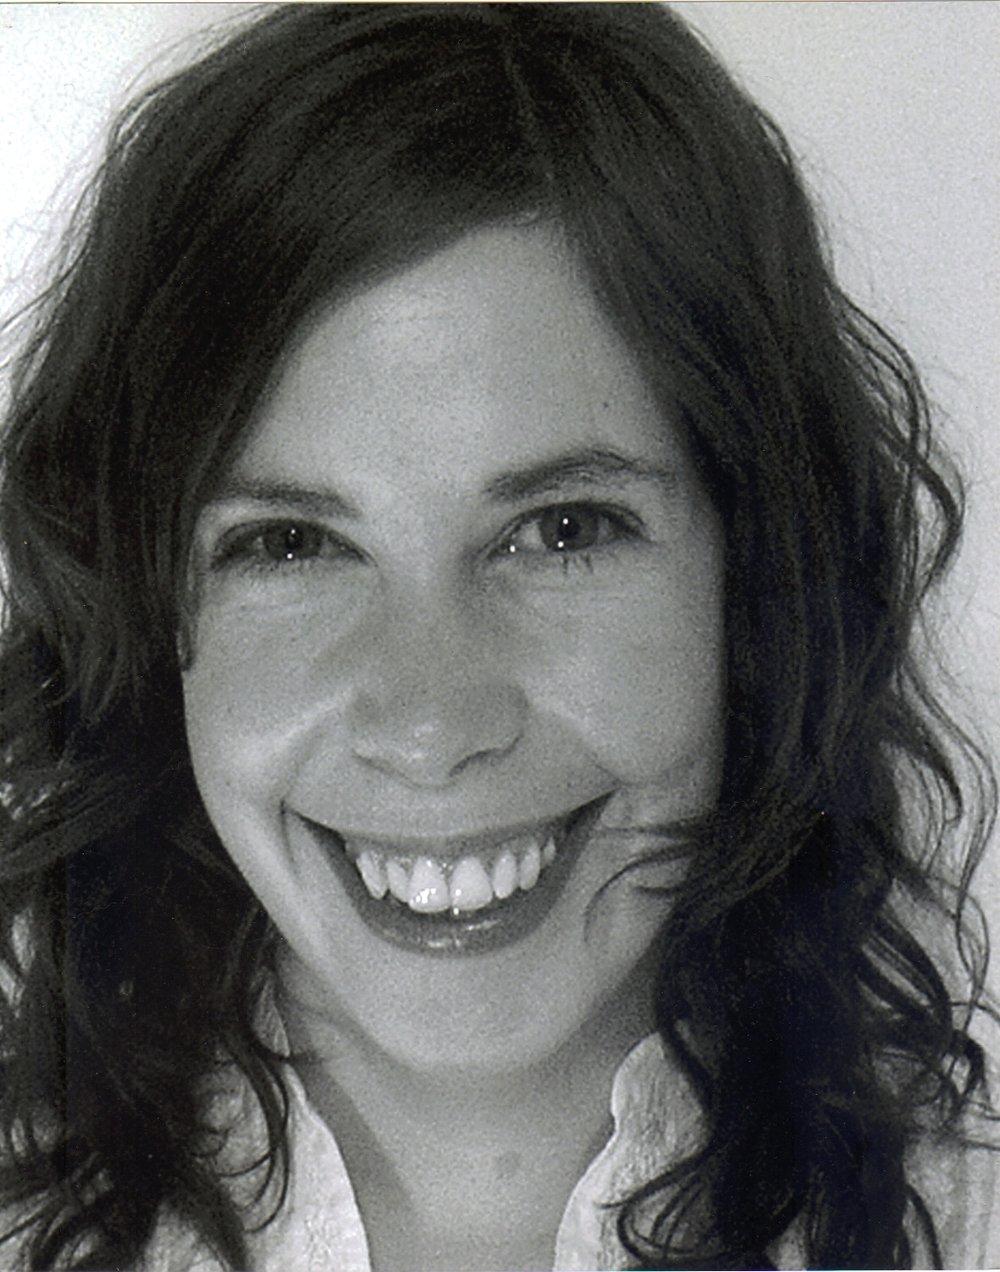 Sarah Wilkins / Immigration Officer